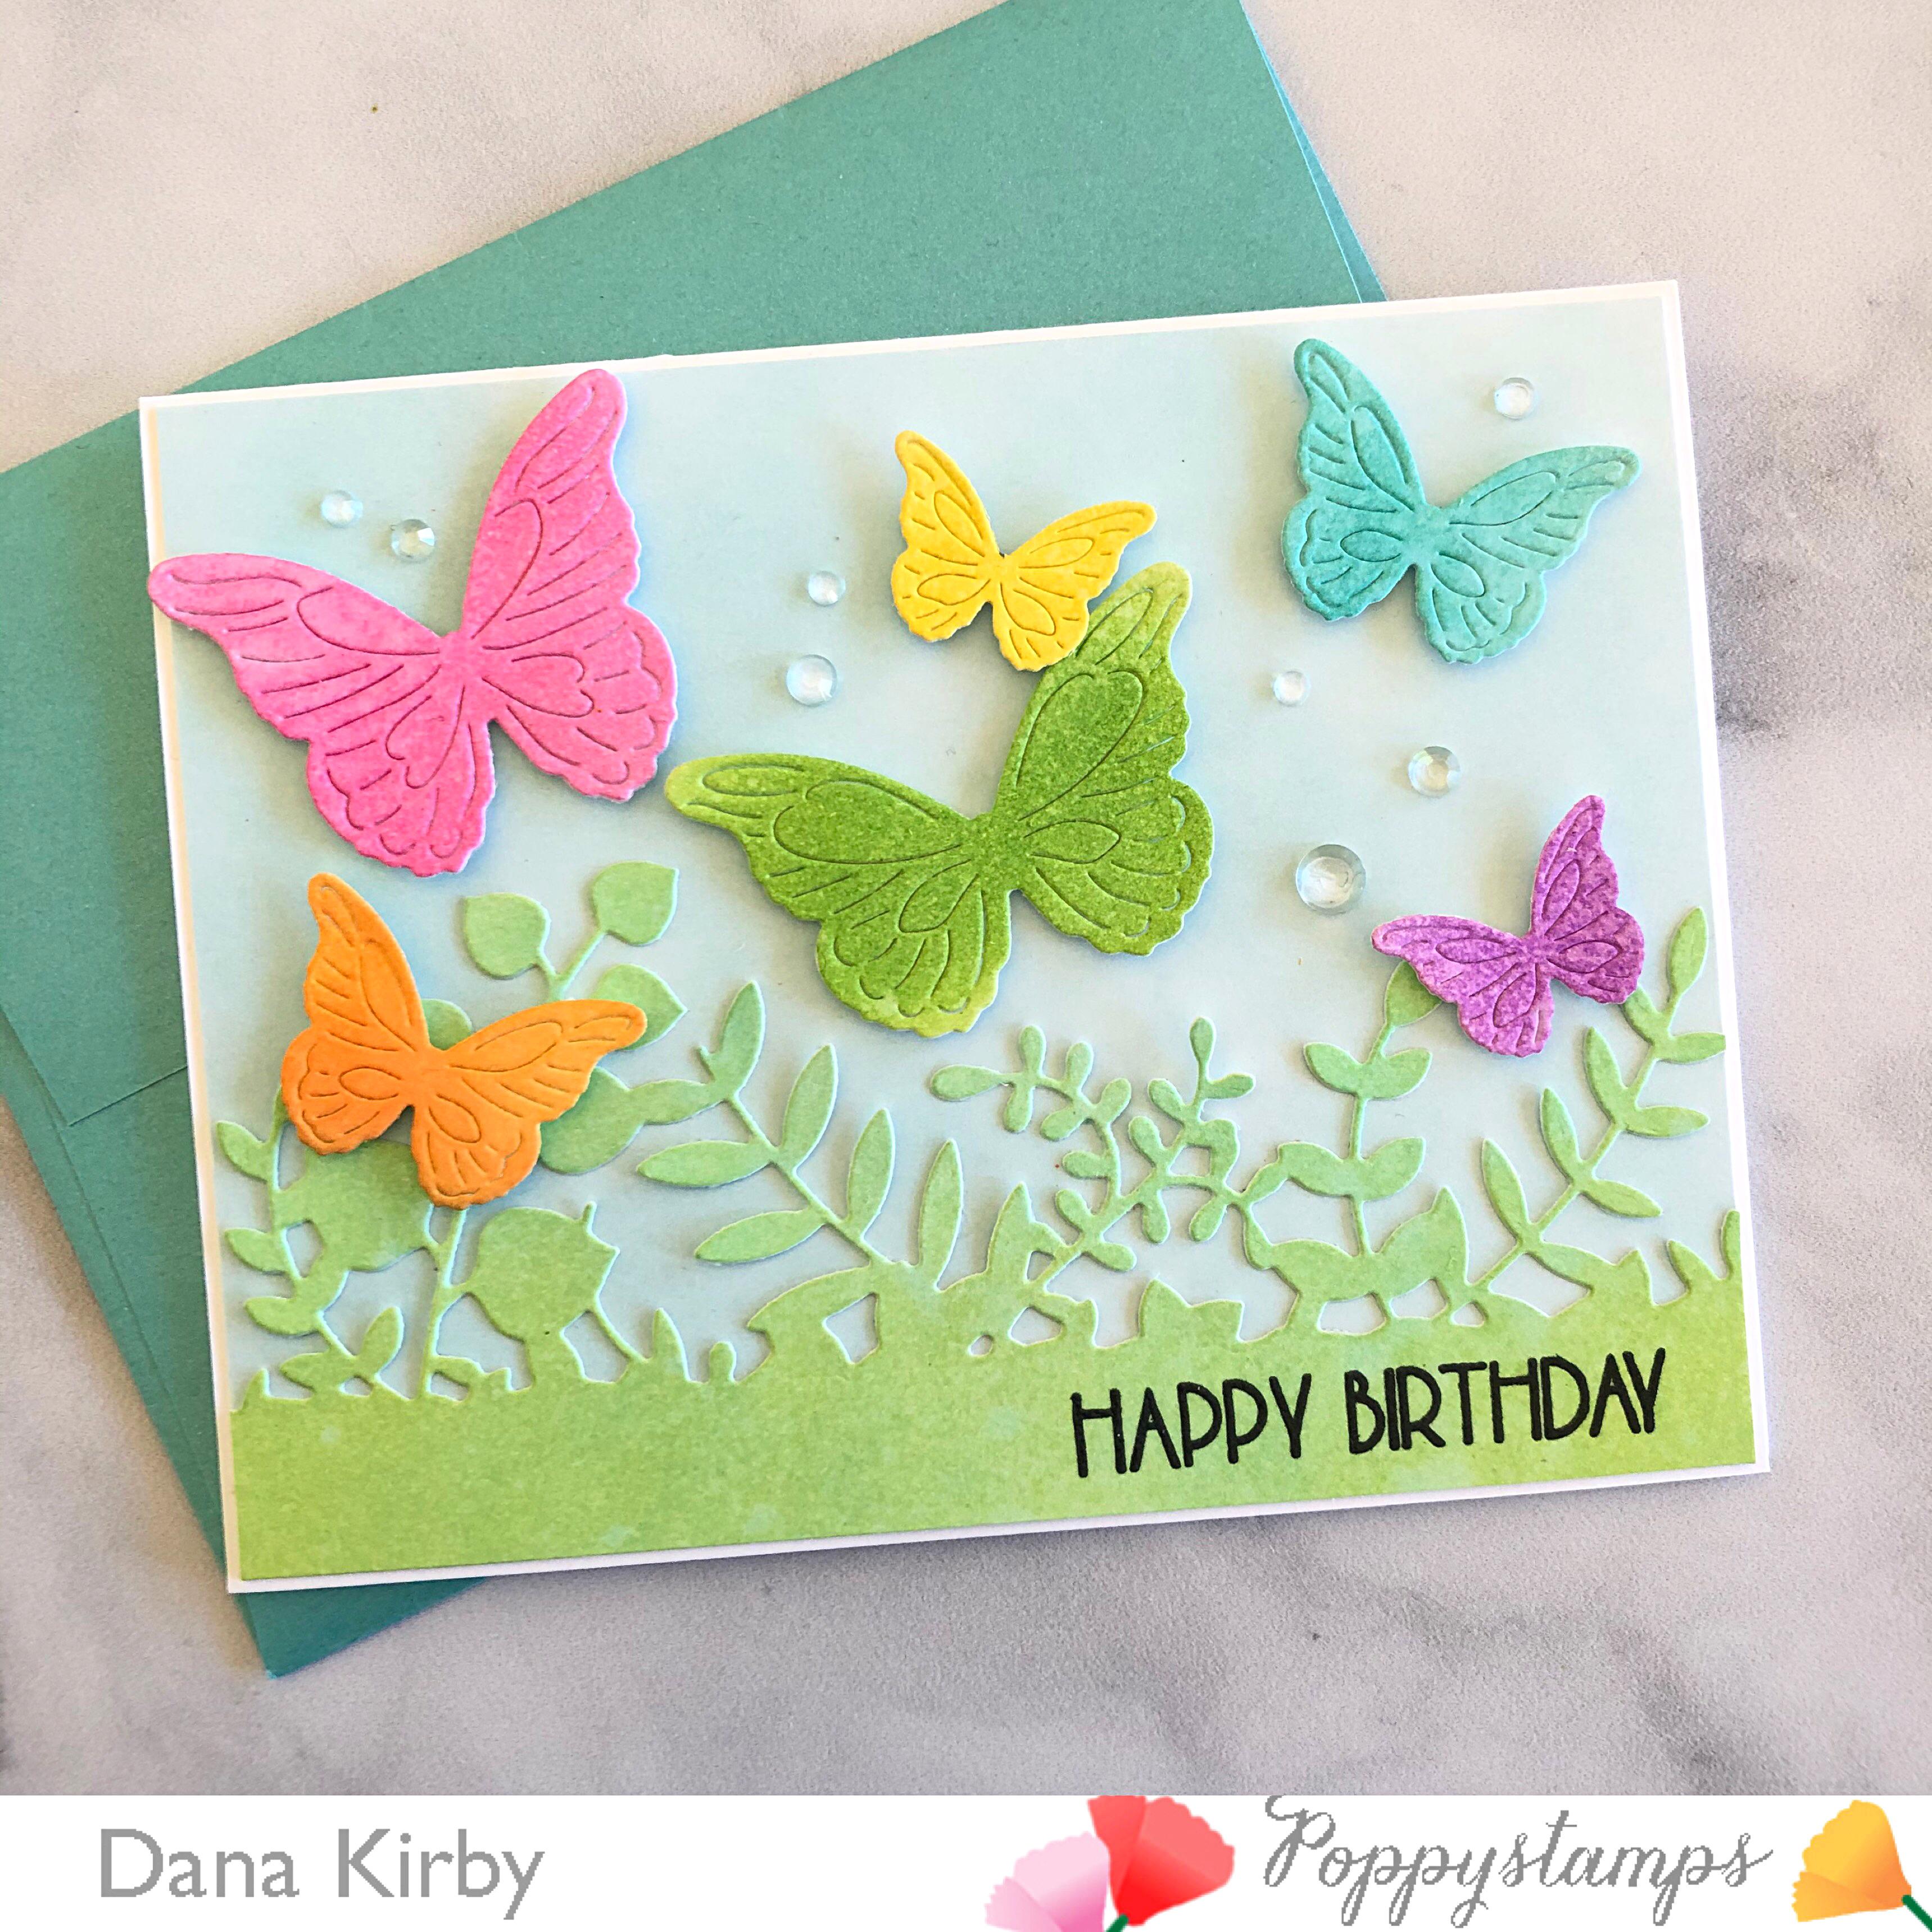 poppystamps: Butterflies